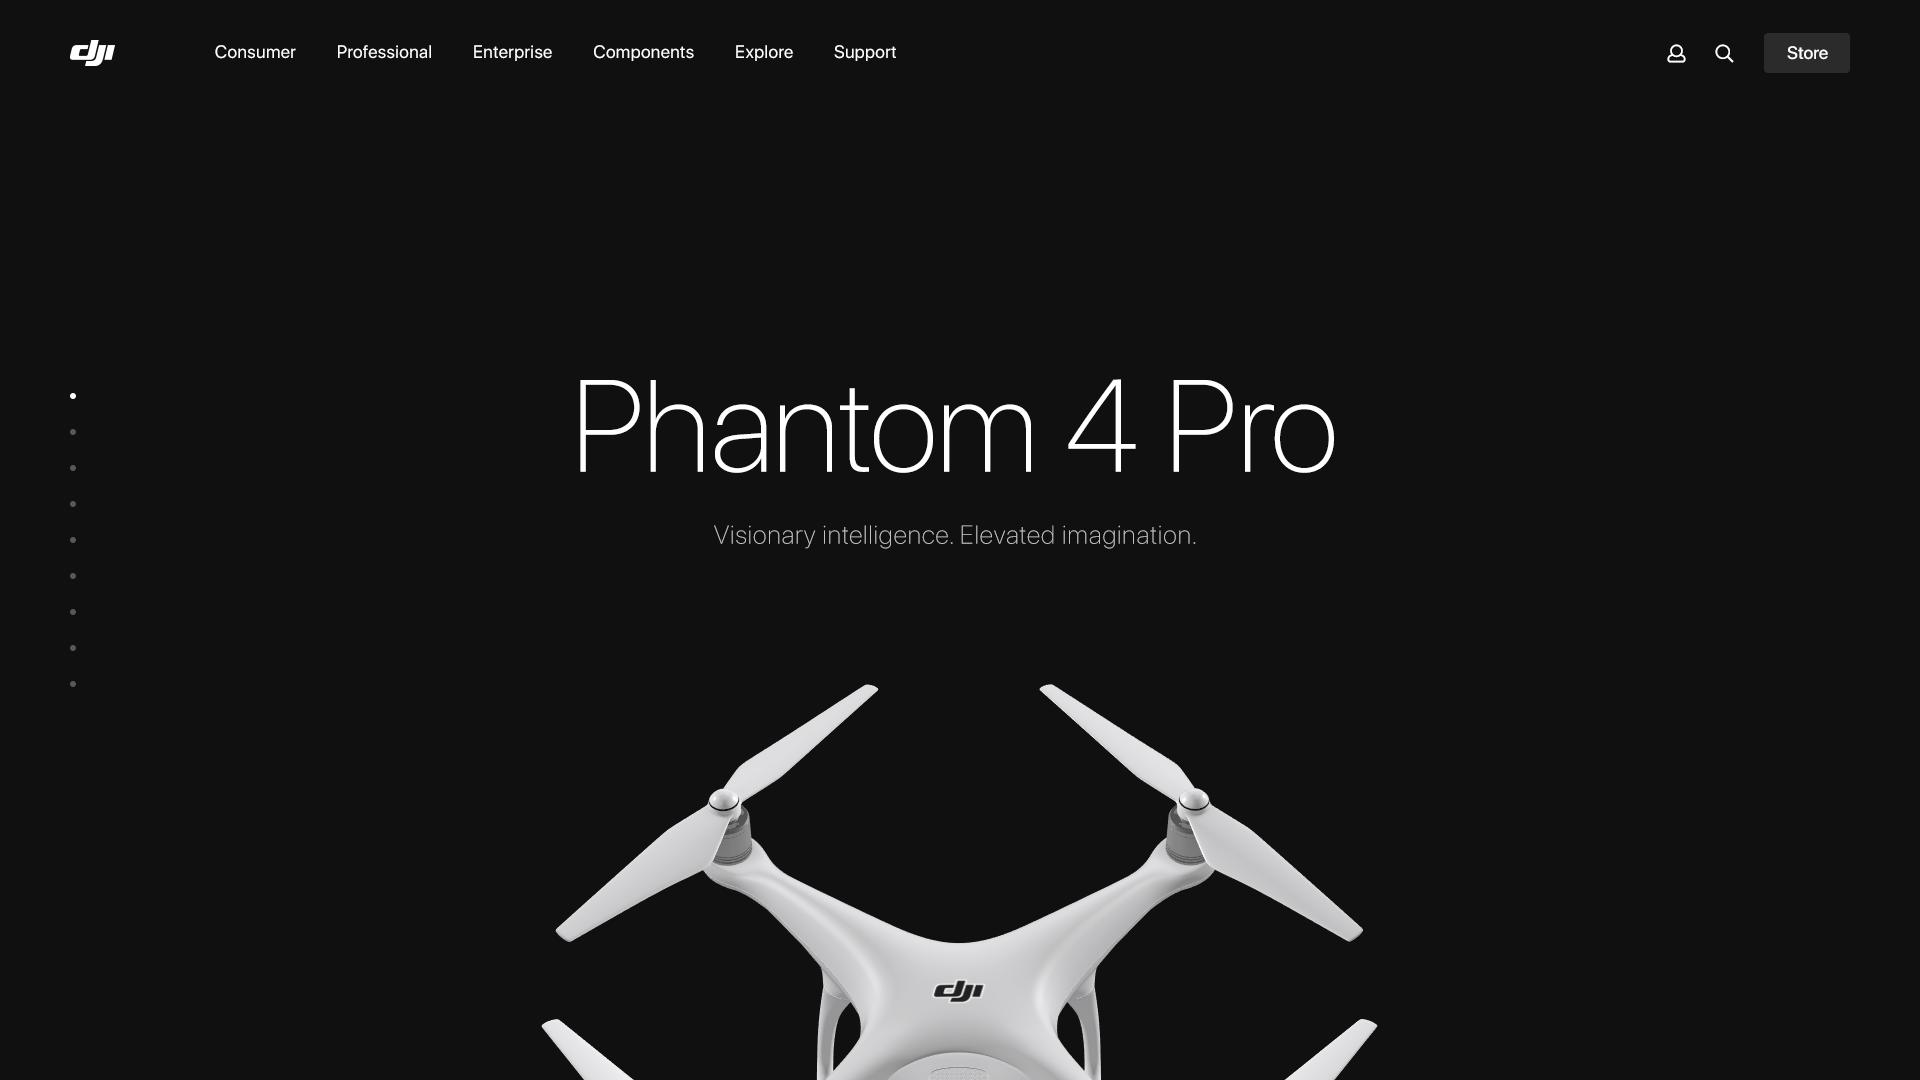 01. phantom 4 pro